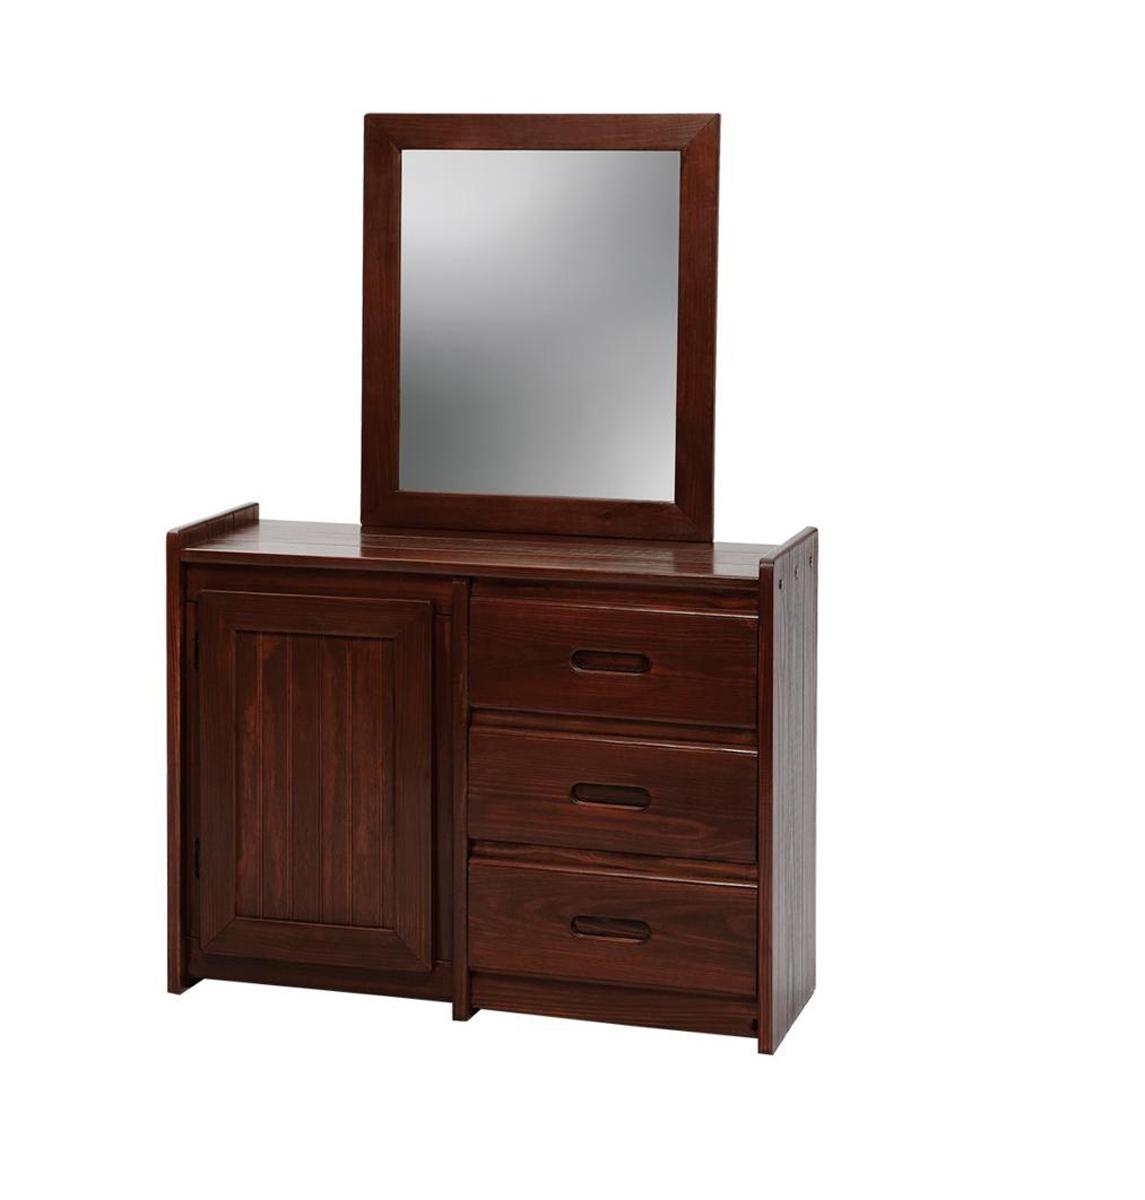 Chelsea Home 360134-011-D 3 Drawer Dresser with Storage Door and Mirror - Dark